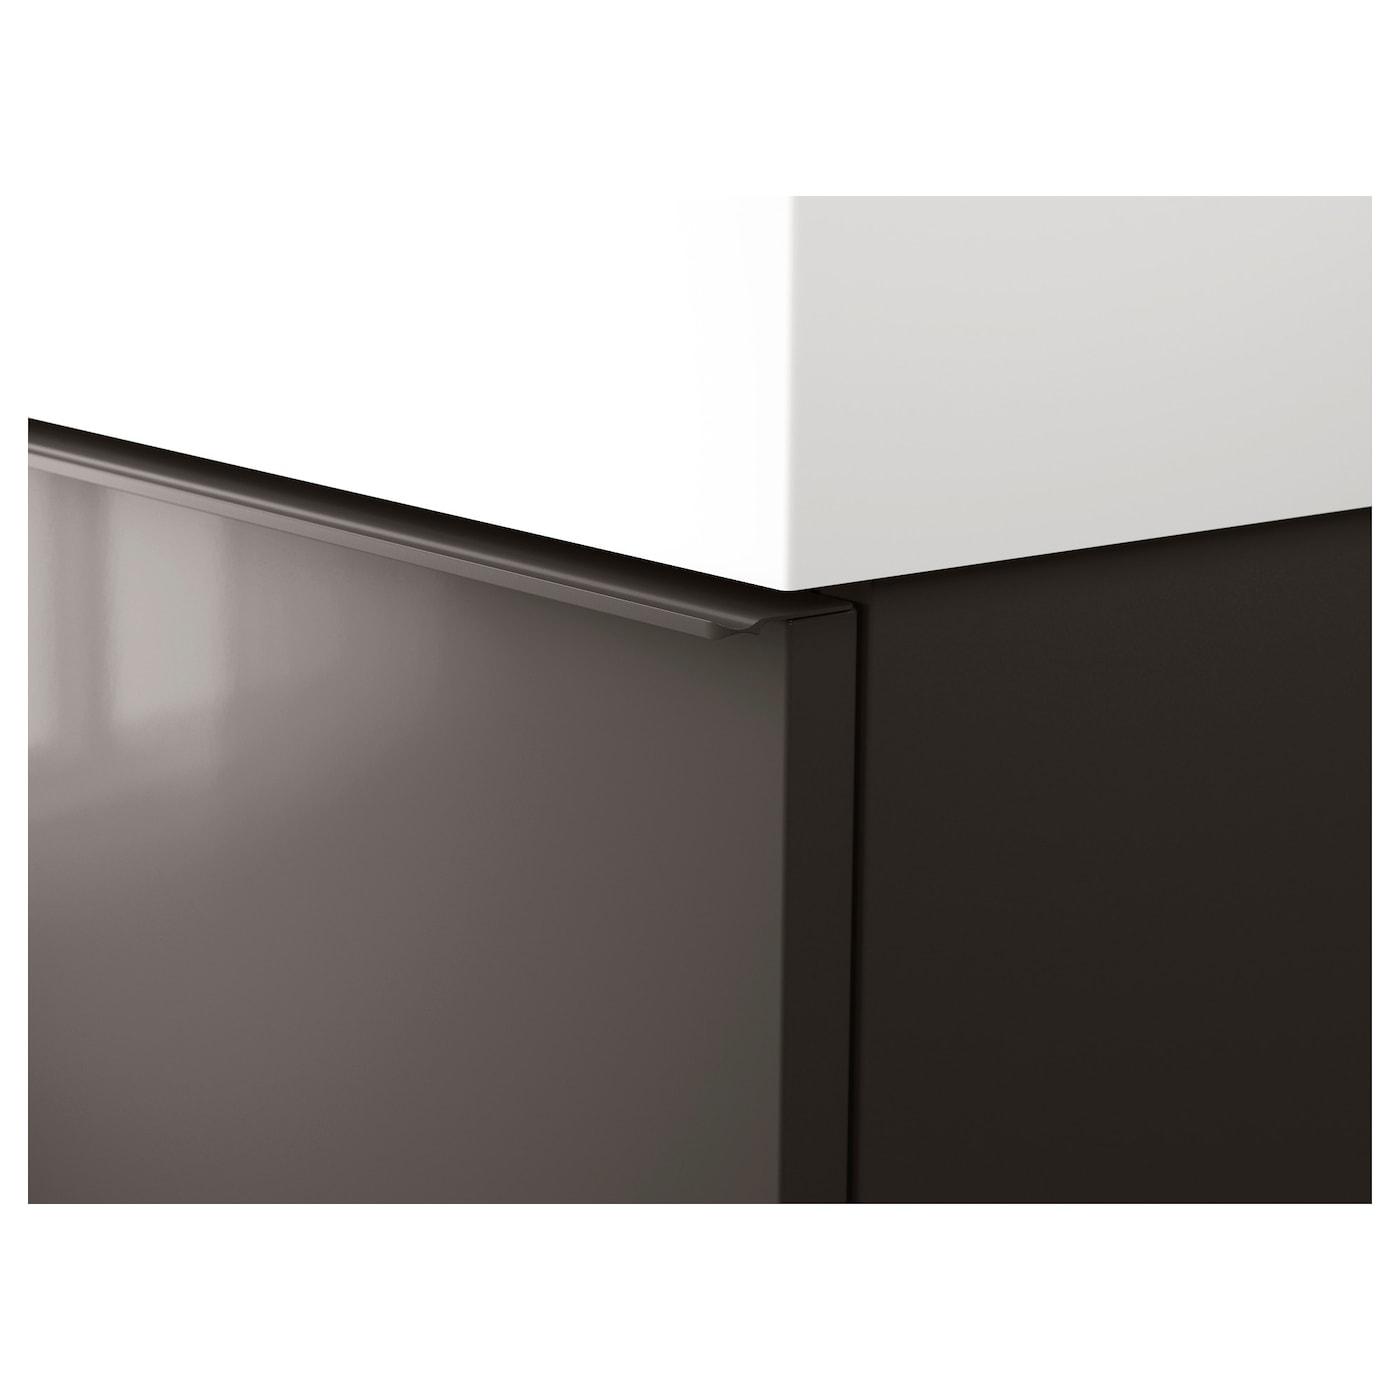 Odensvik godmorgon meuble lavabo 4tir brillant gris 120x49x64 cm ikea - Ikea meuble salle de bain godmorgon ...